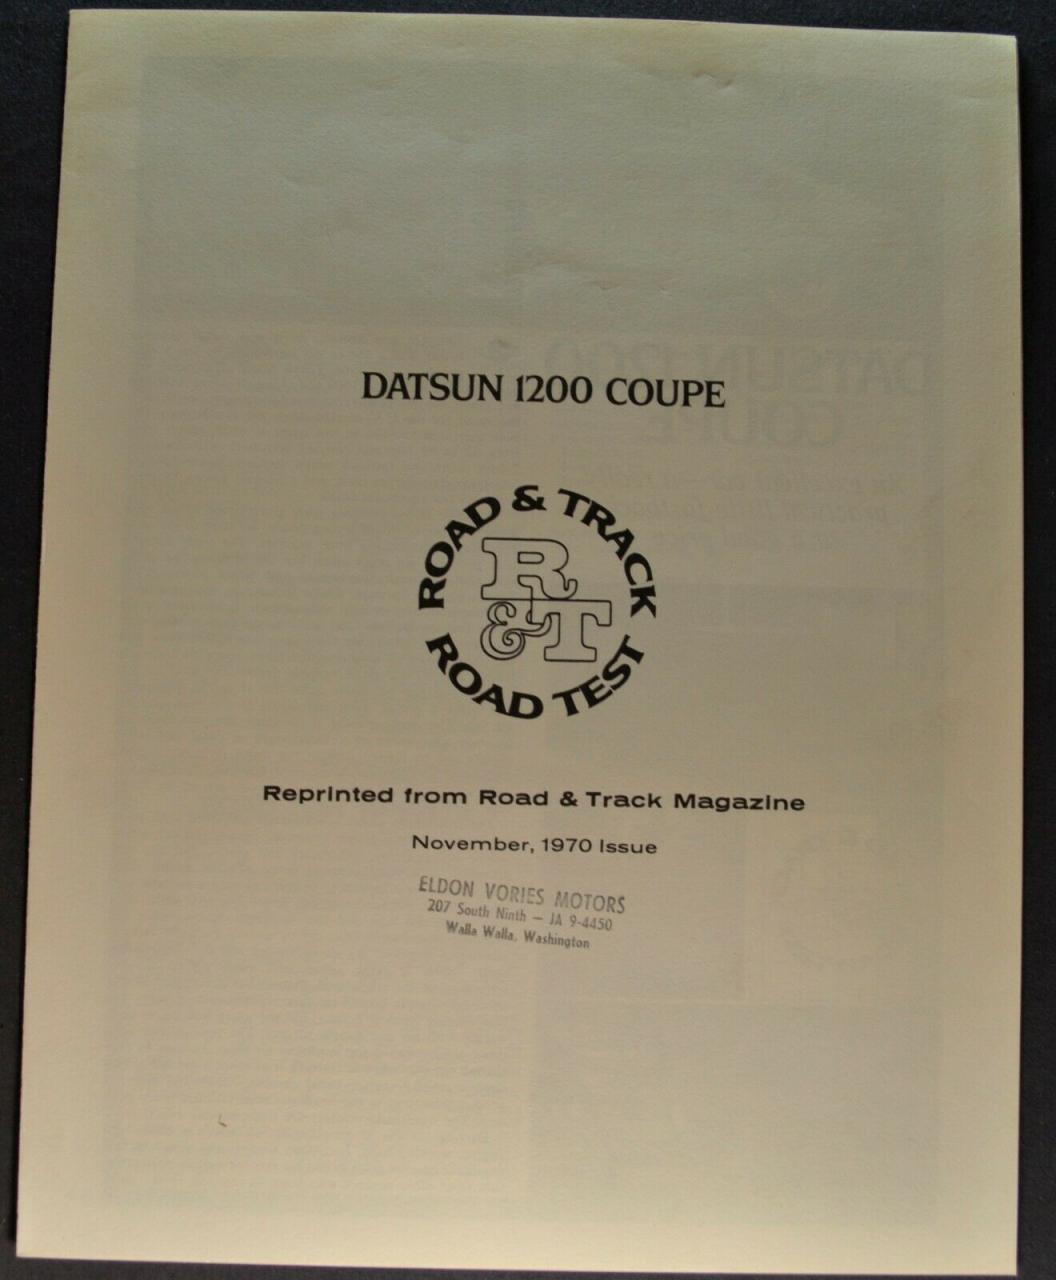 Datsun 1200 Coupe Road Test 1/4